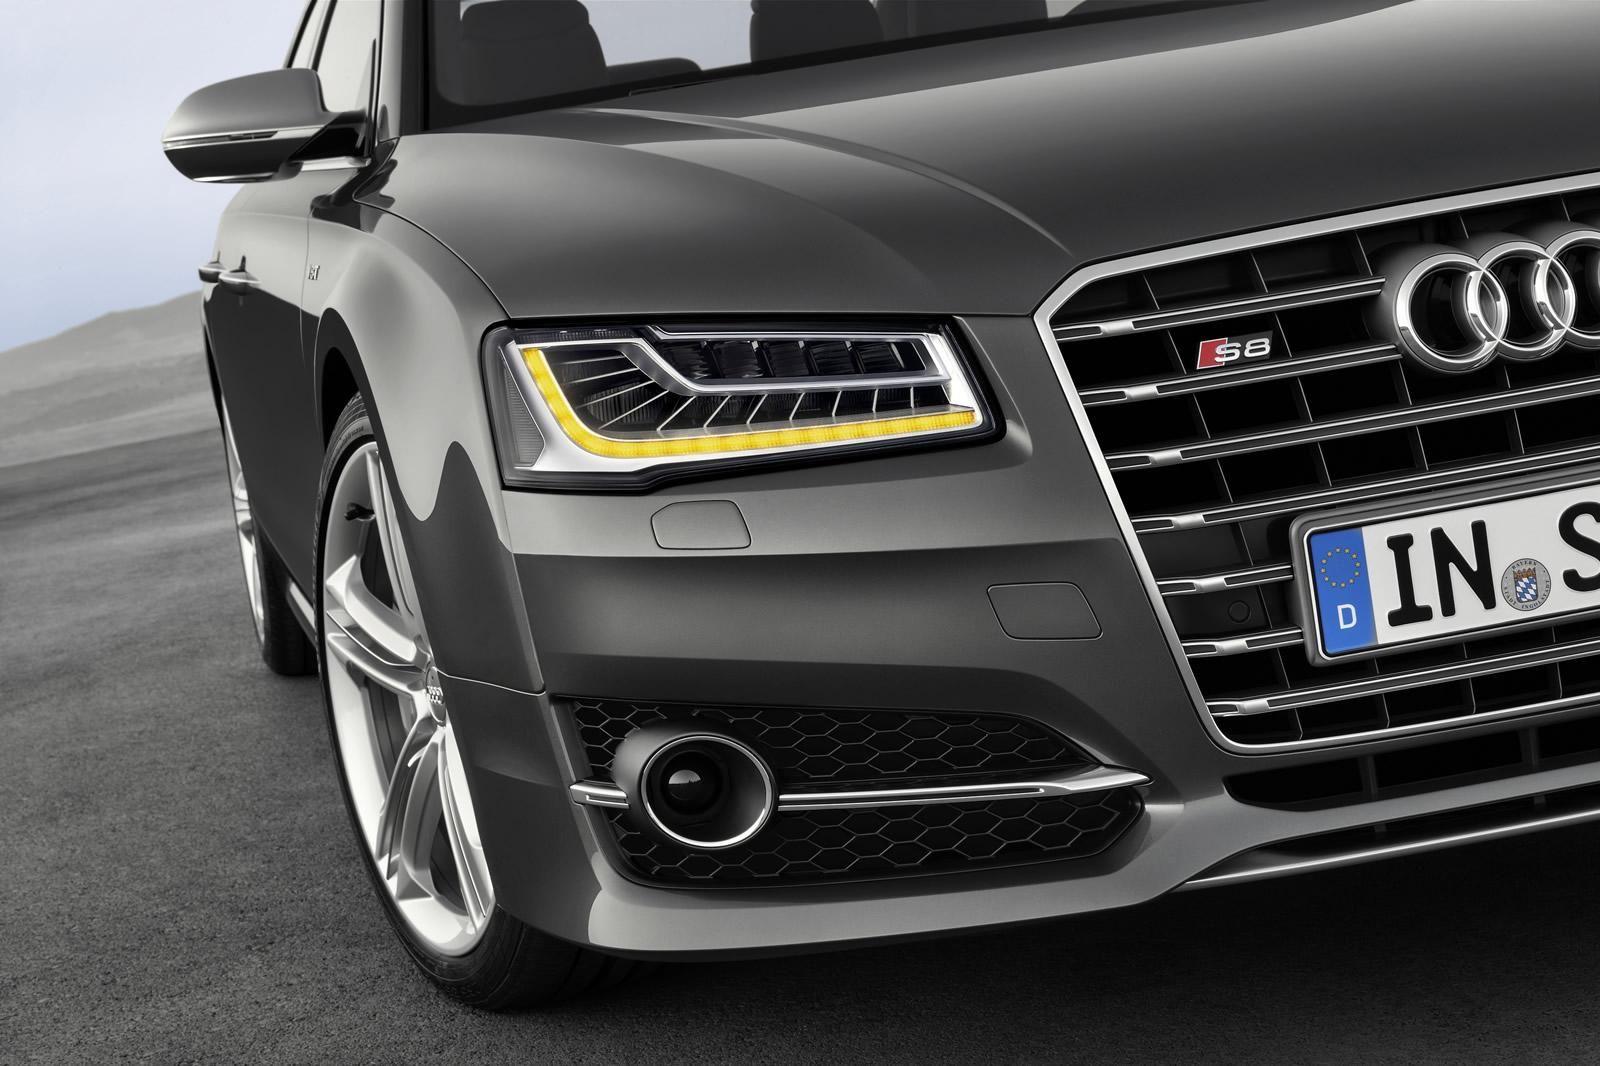 Audi A8 Lights Hd Wallpapers Ultra Hd Car Wallpapers Audi A8 Audi Neuwagen